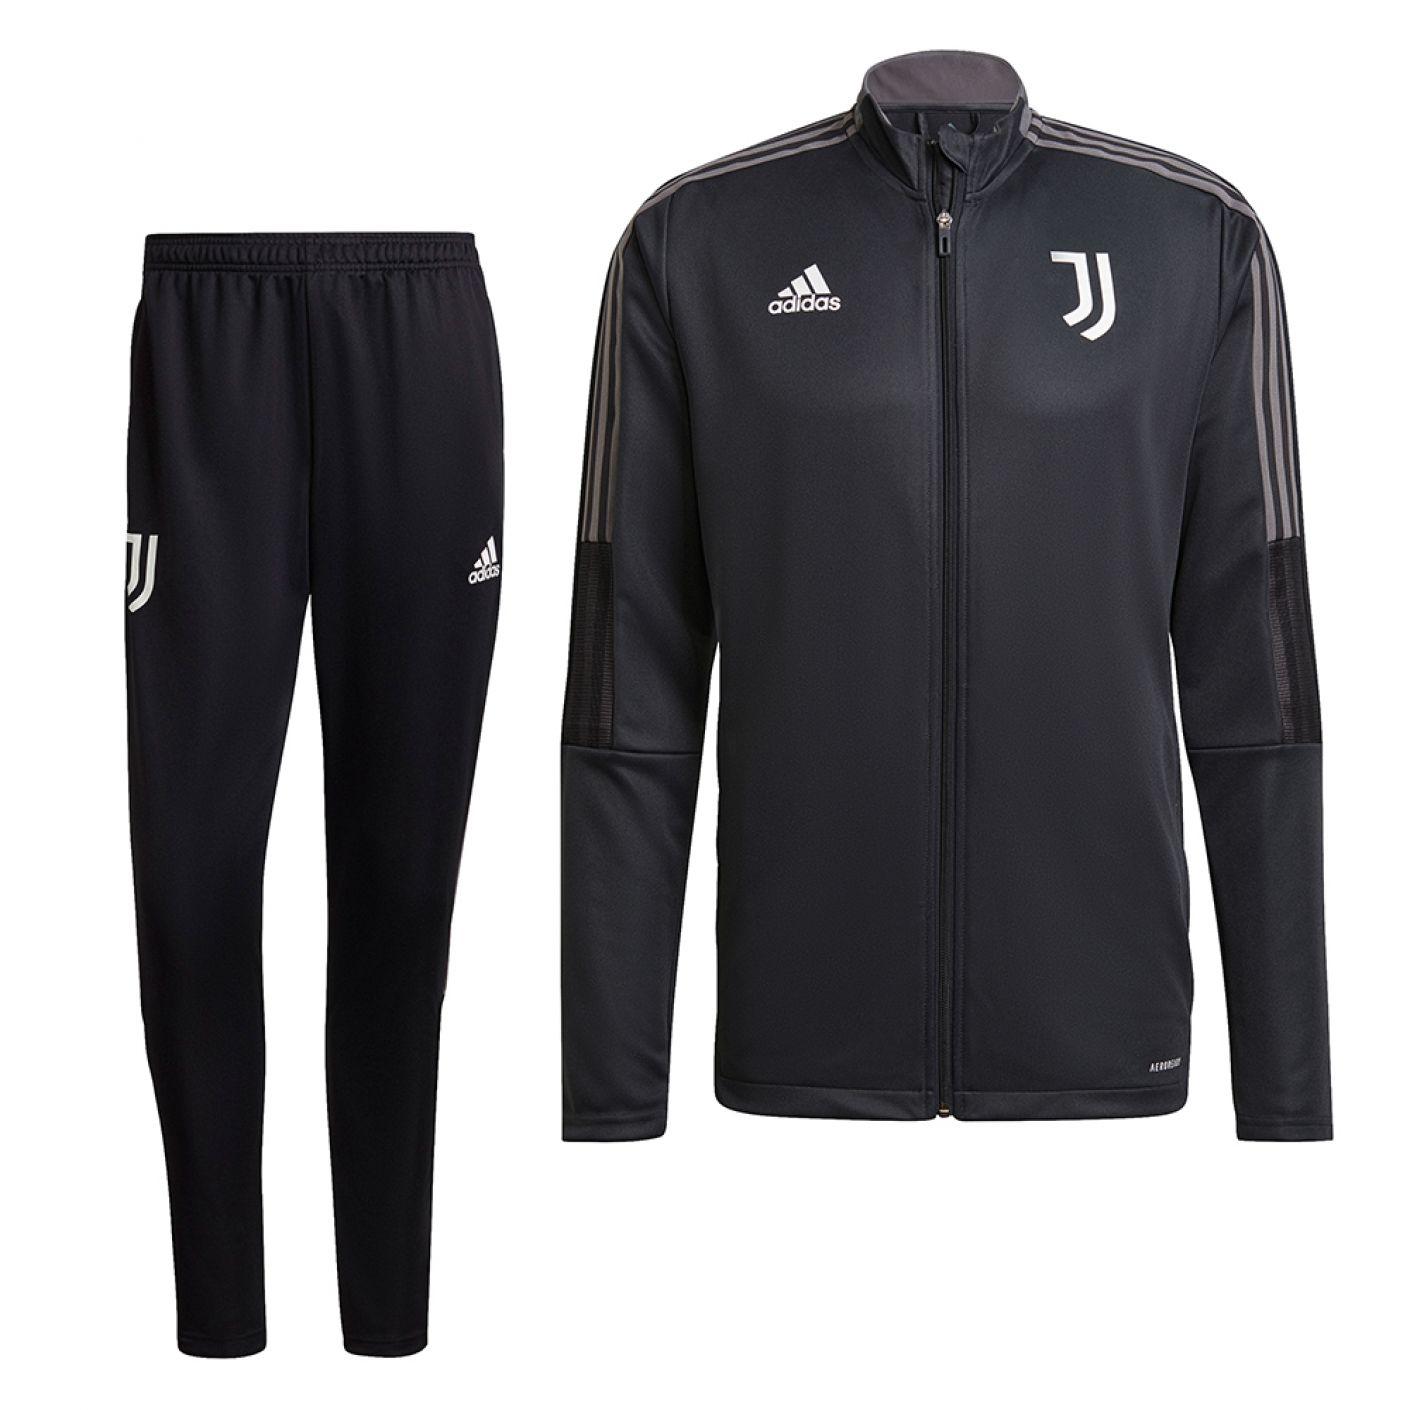 adidas Juventus Trainingspak 2021-2022 Donkergrijs